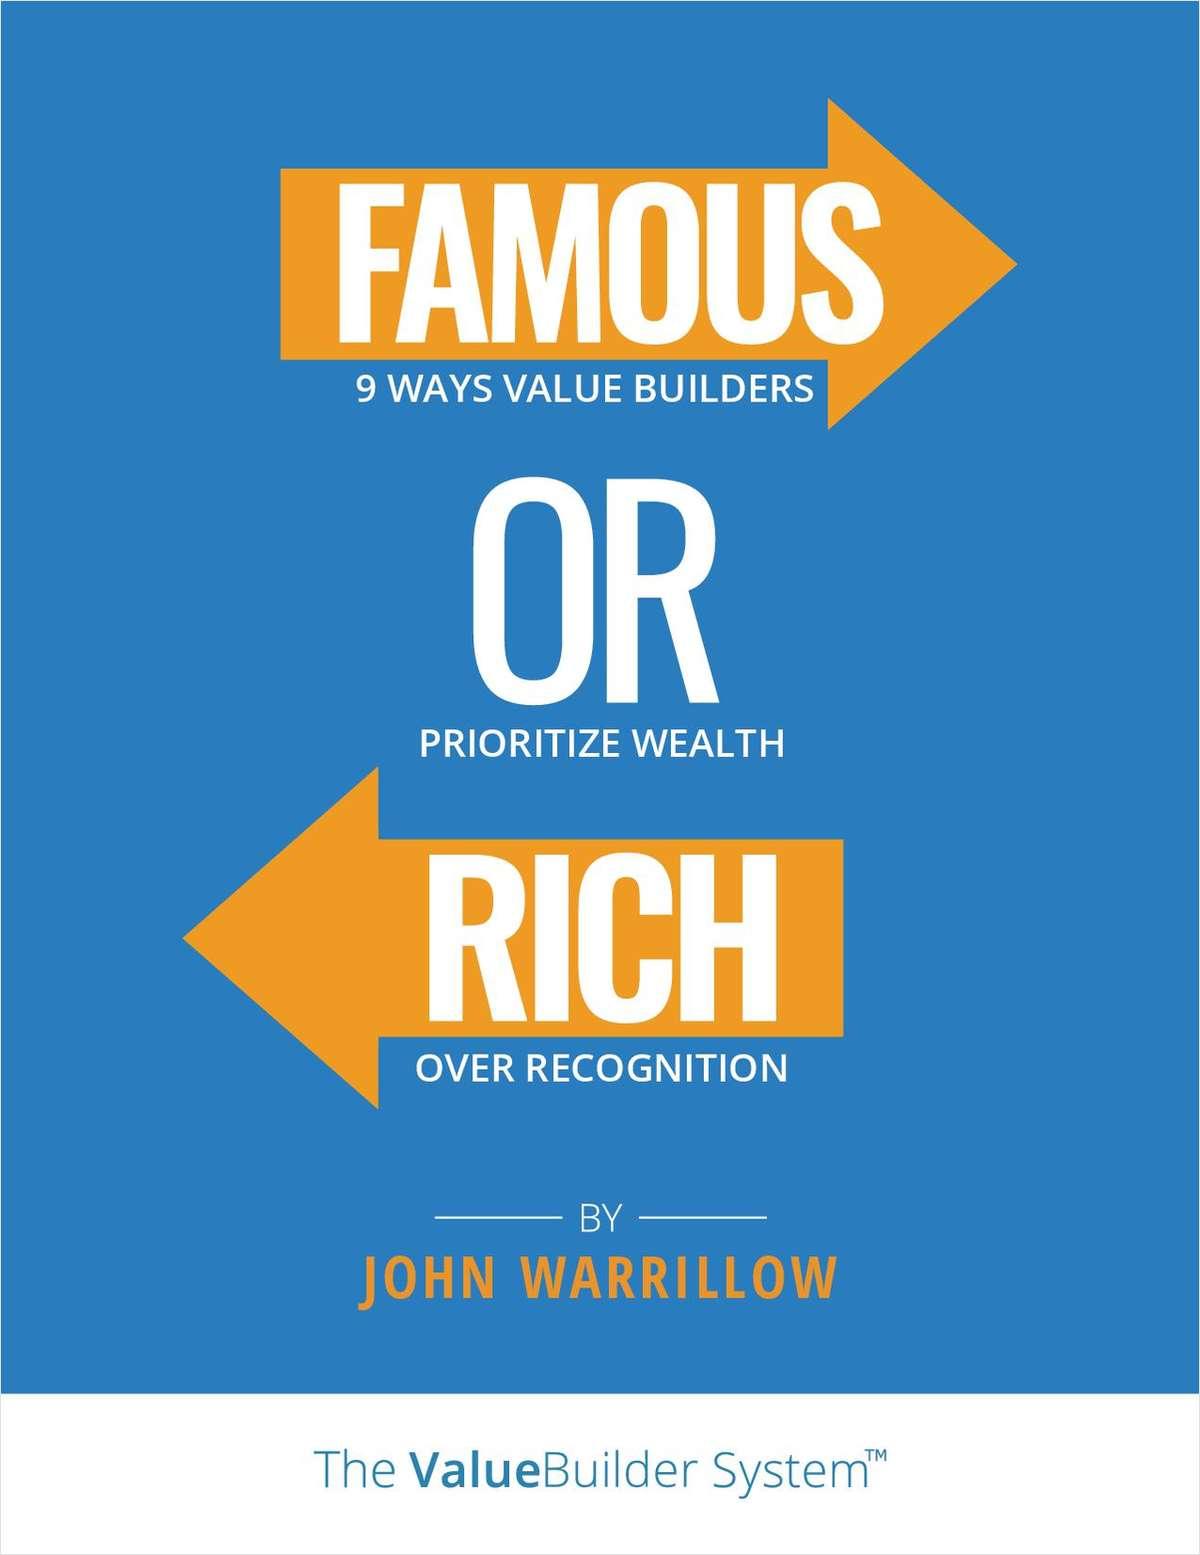 Famous or Rich